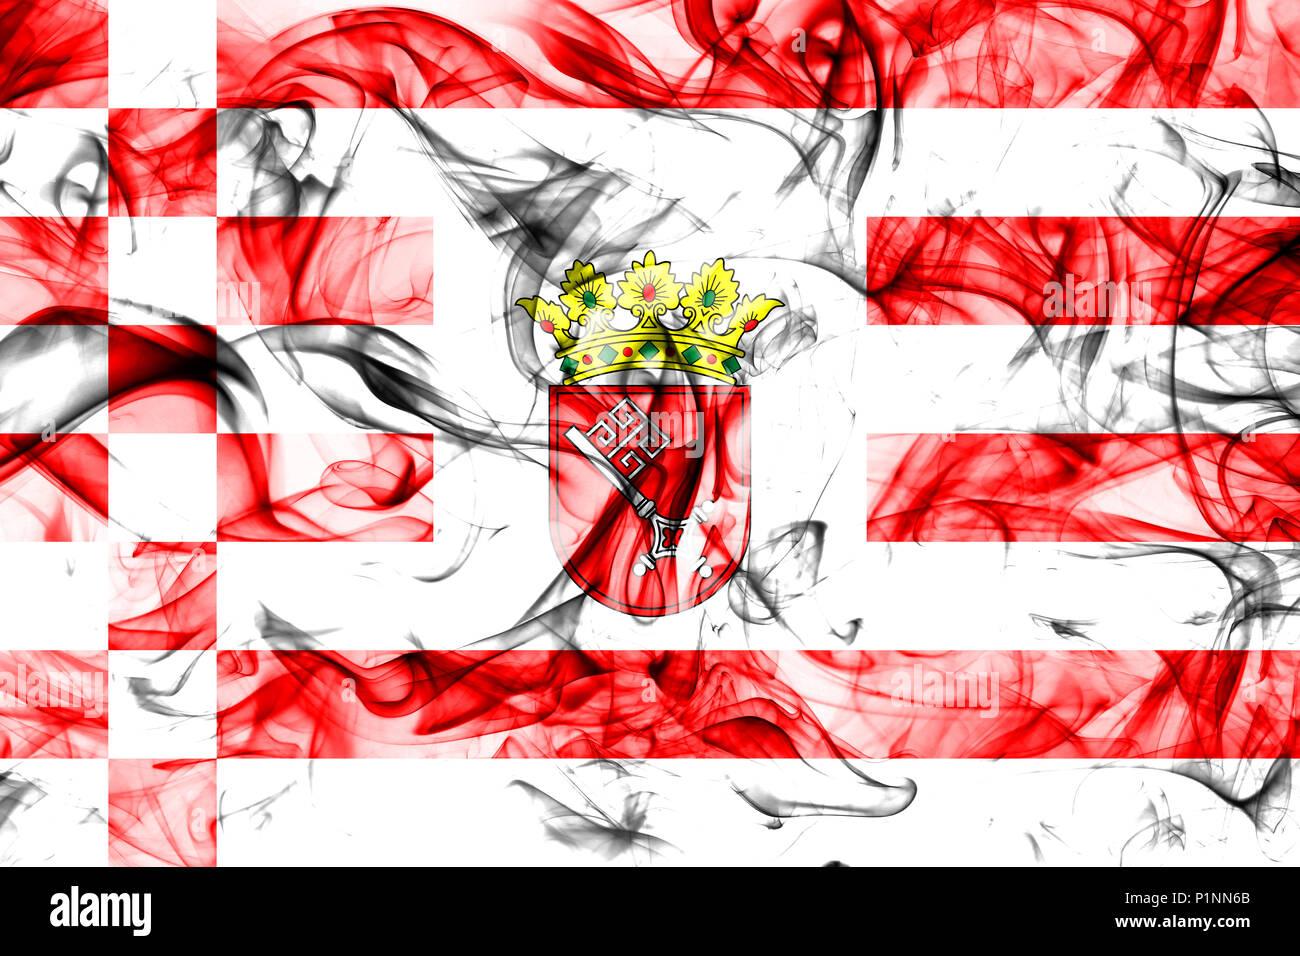 Bremen smoke flag, Northern Germany - Stock Image